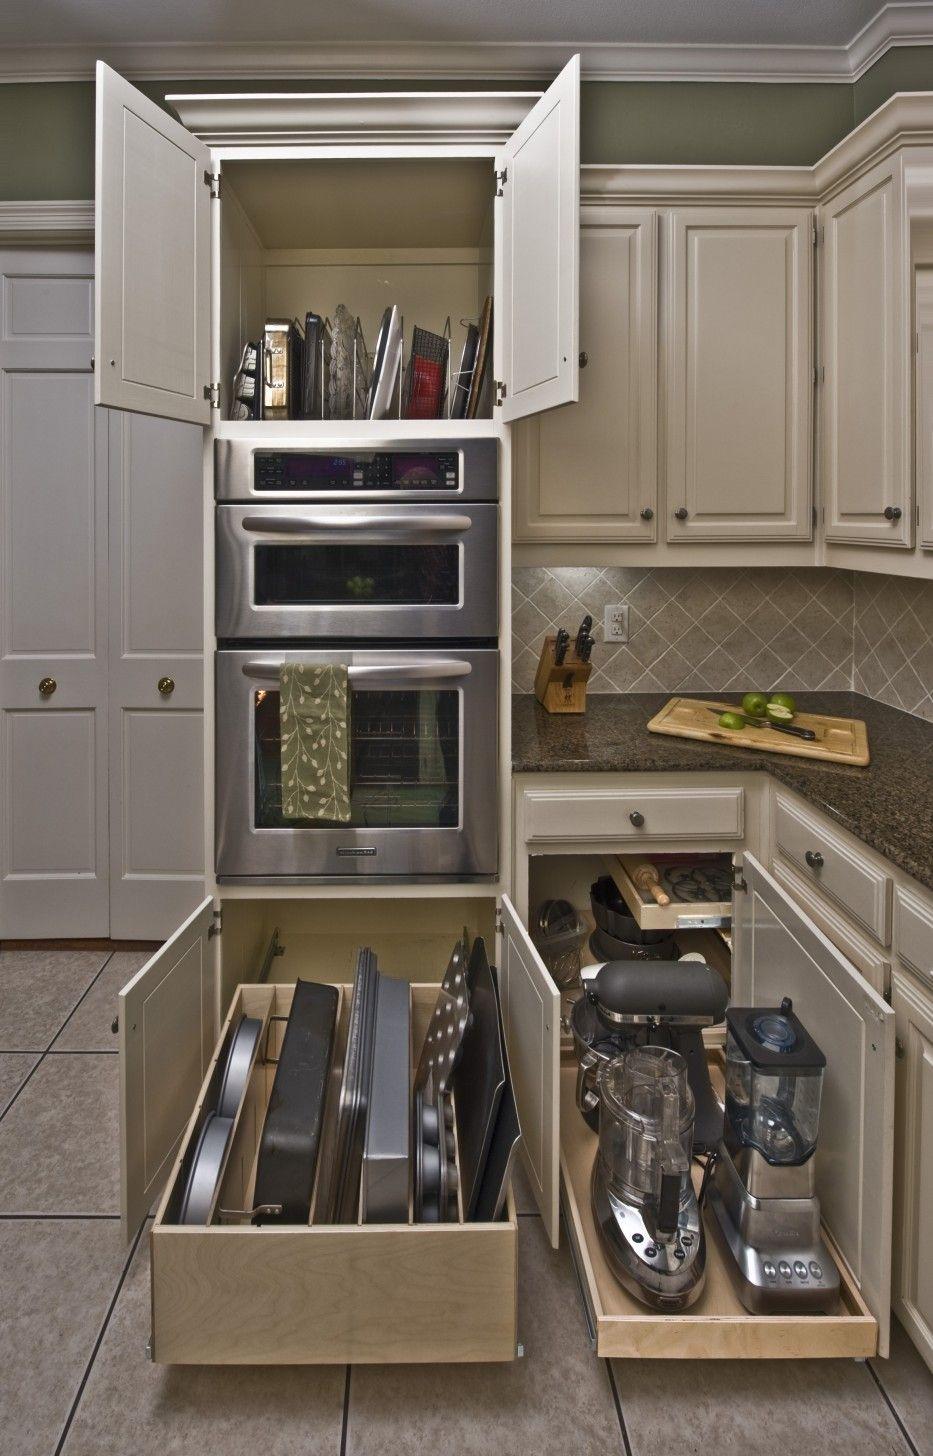 best kitchen storage cabinet glide out shelves storage cabinet solution kitchenstorage on kitchen organization cabinet layout id=54415